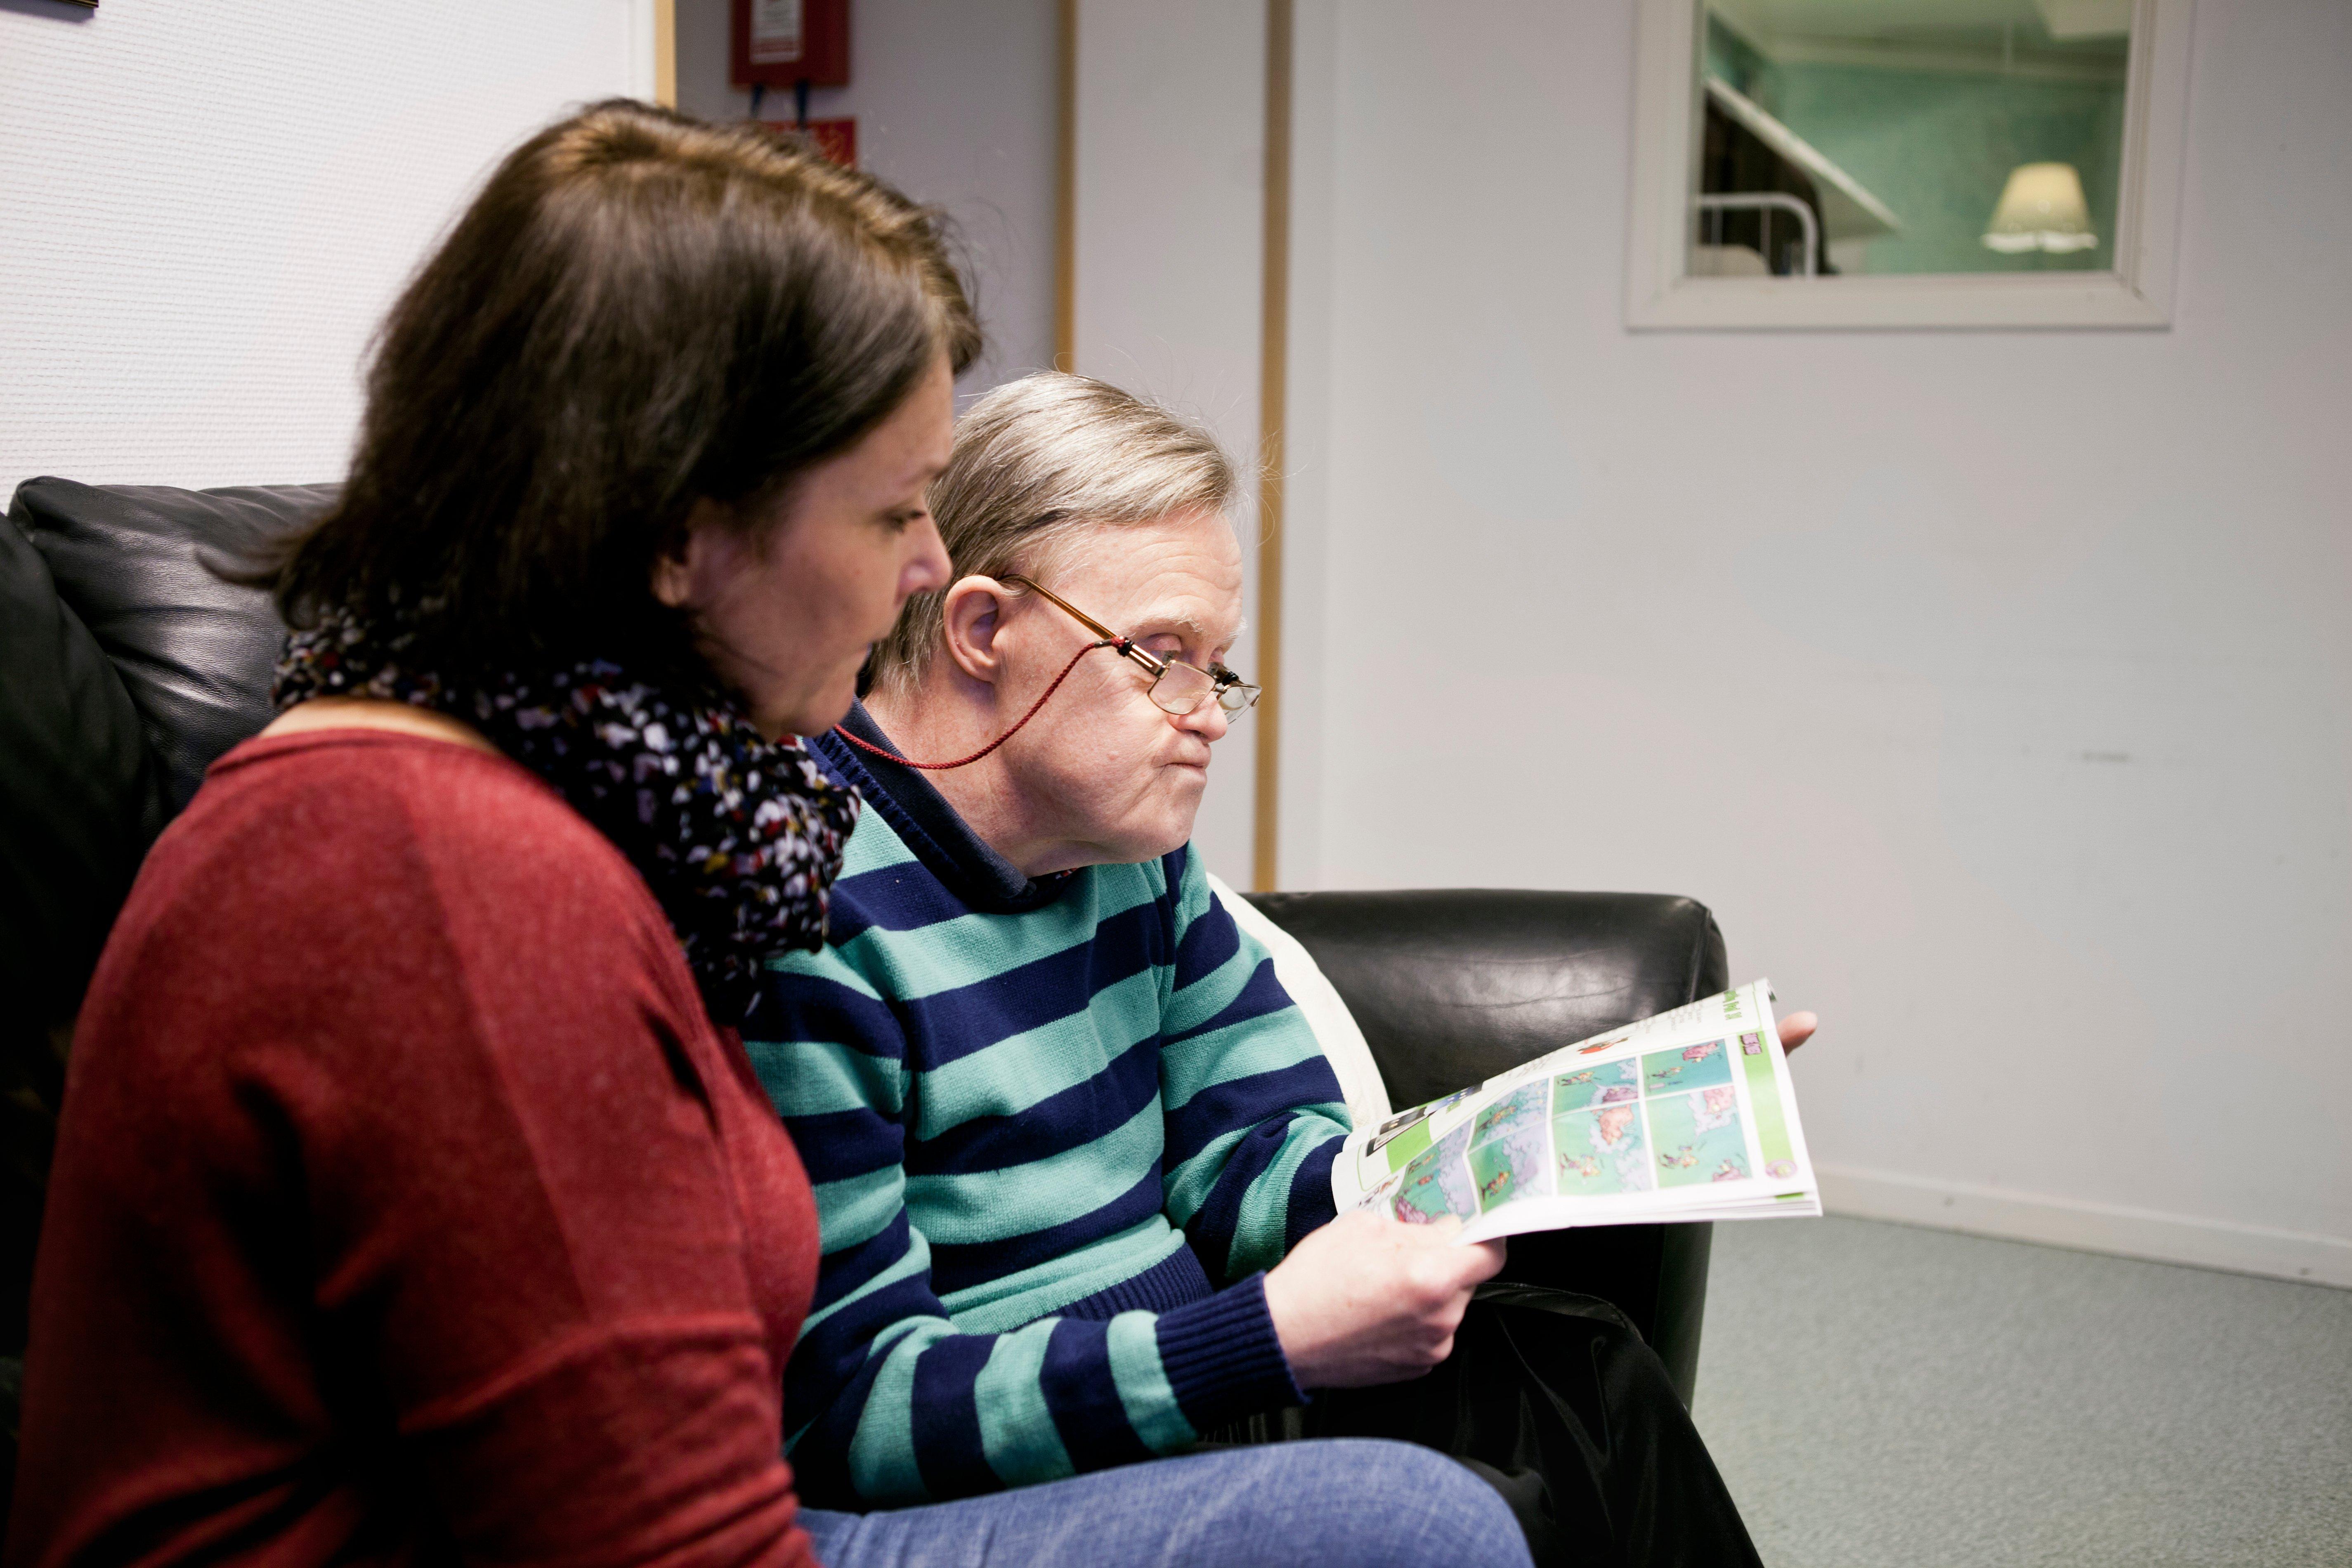 caregiver-sitting-with-special-needs-senior-man